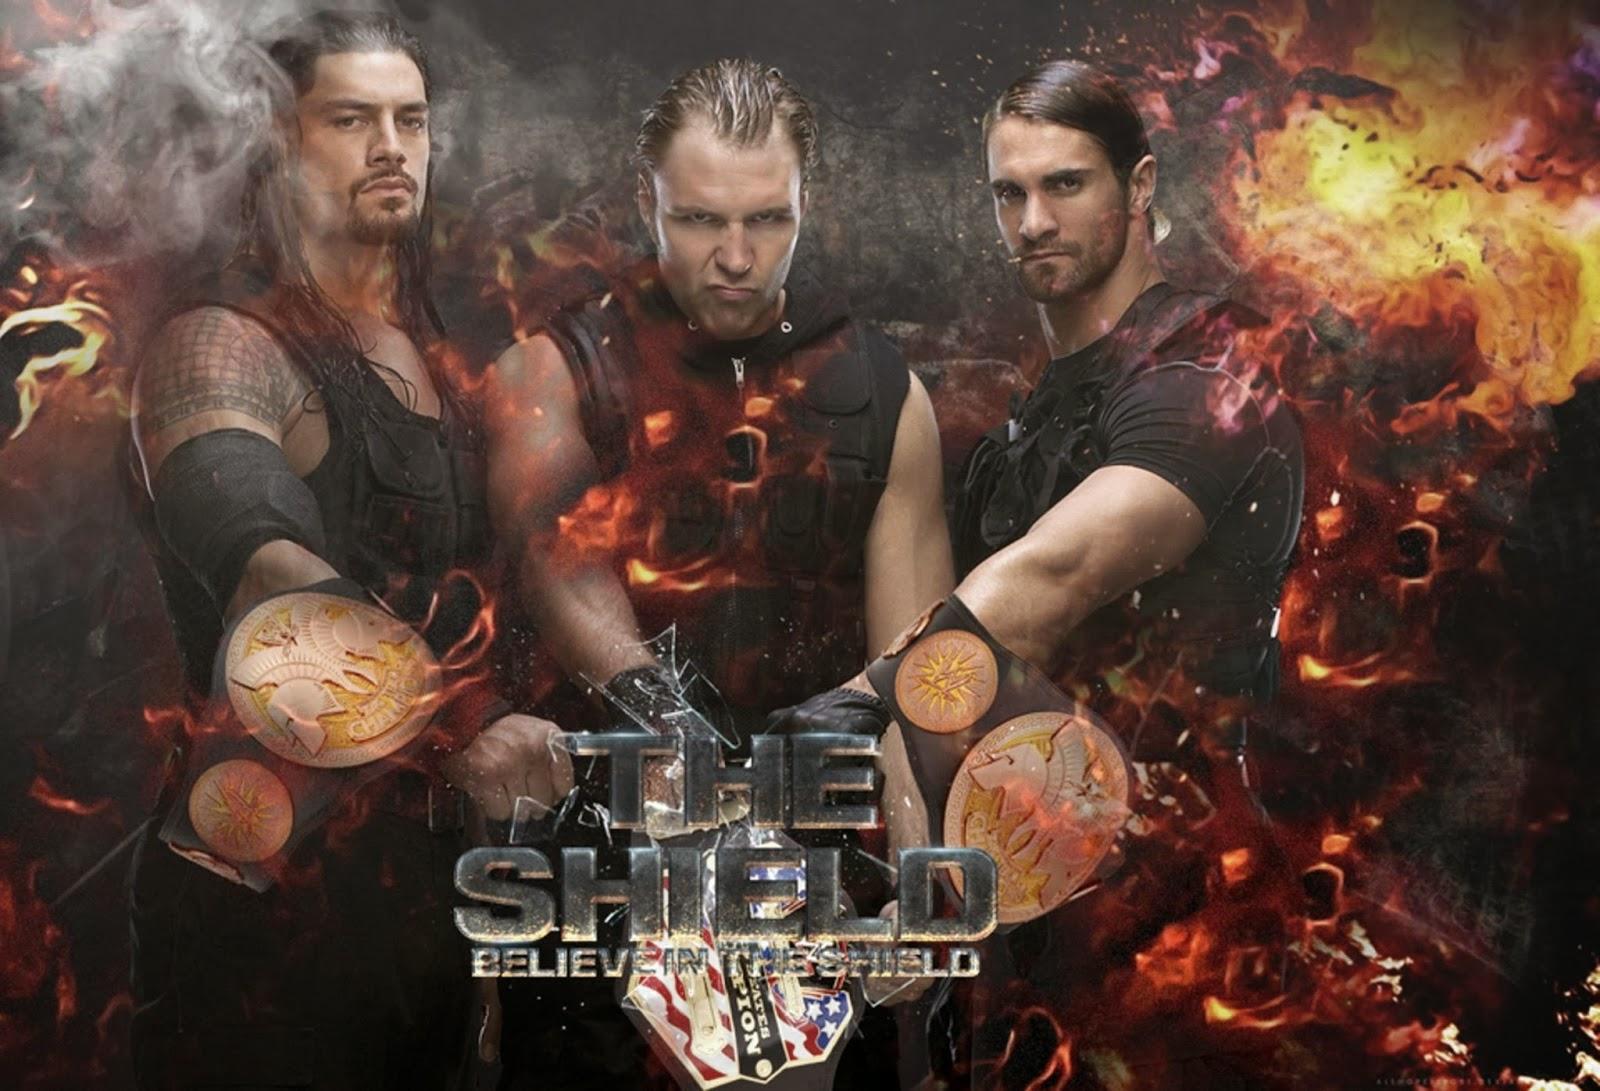 the shield hd wallpapers wwe hd wallpaper free download